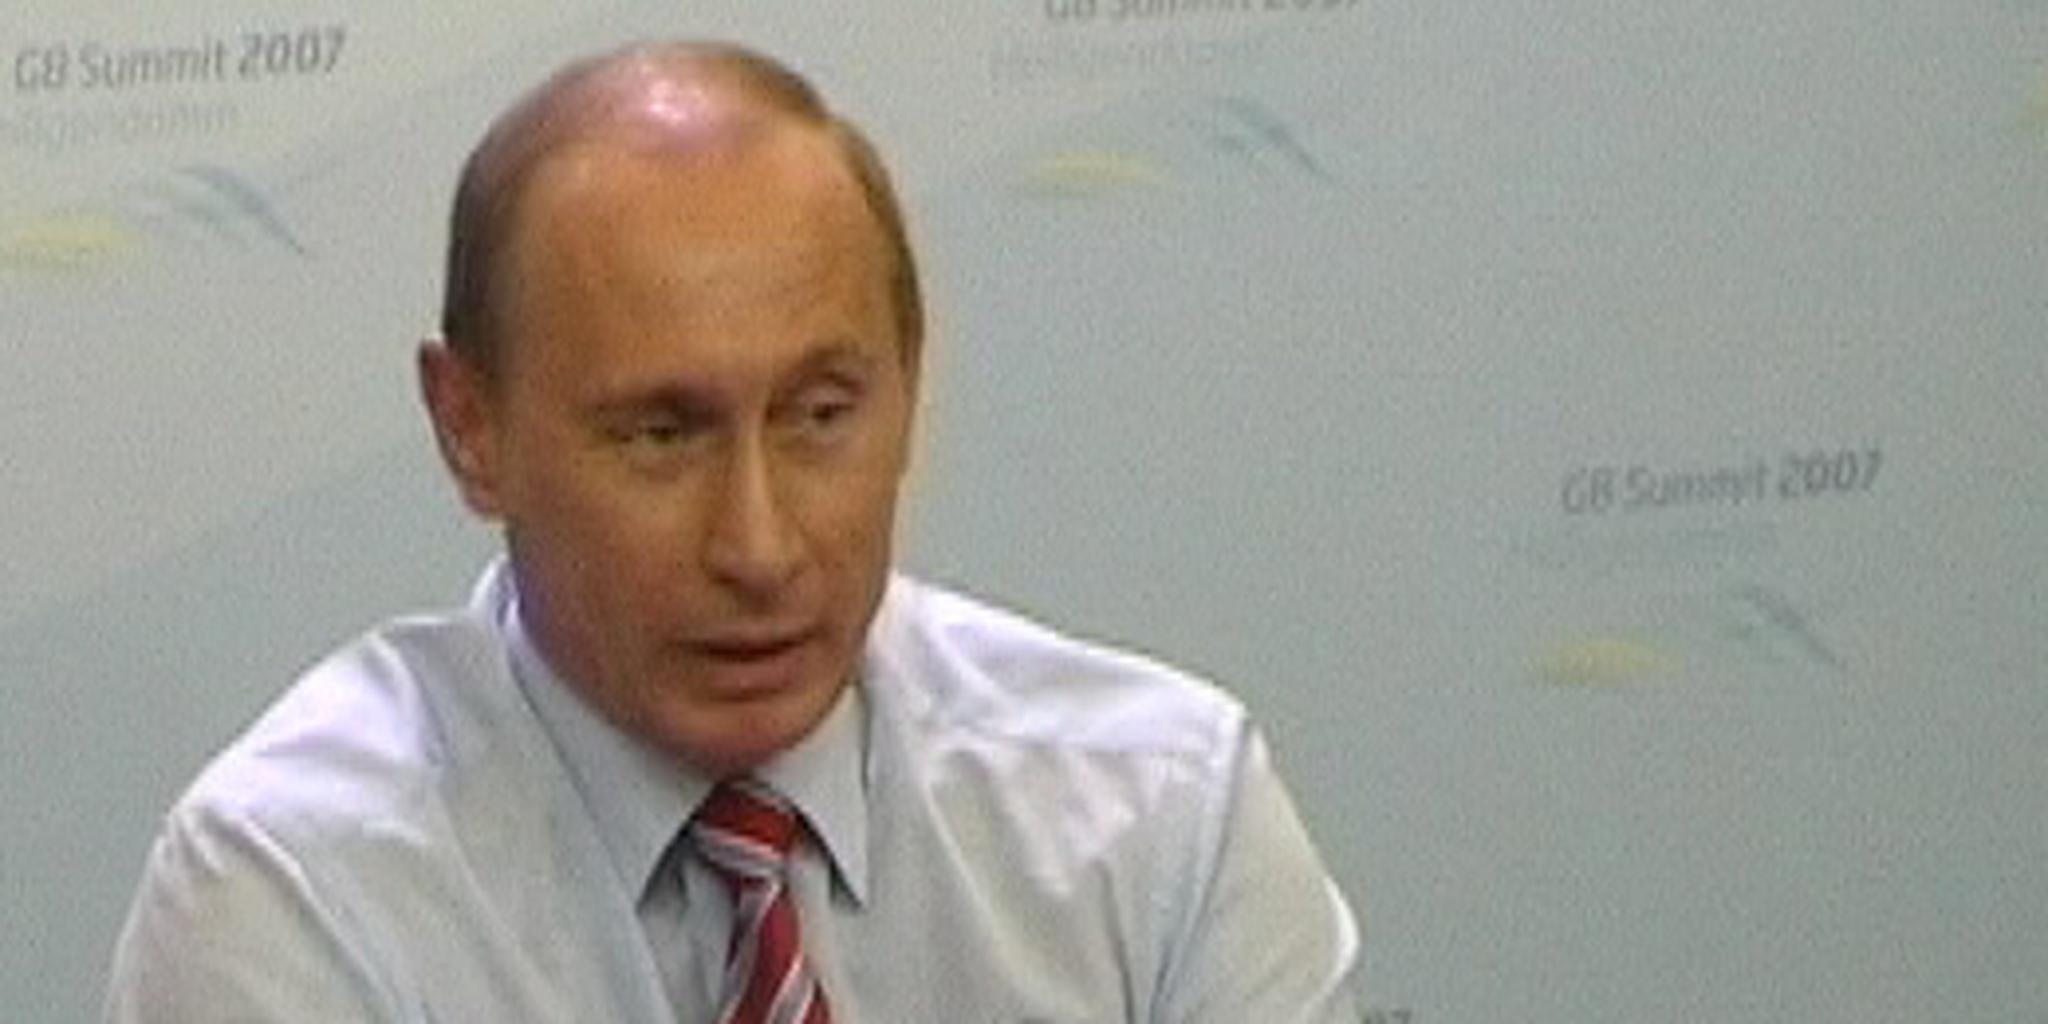 All sizes | Vladimir_Putin_8 | Flickr - Photo Sharing!